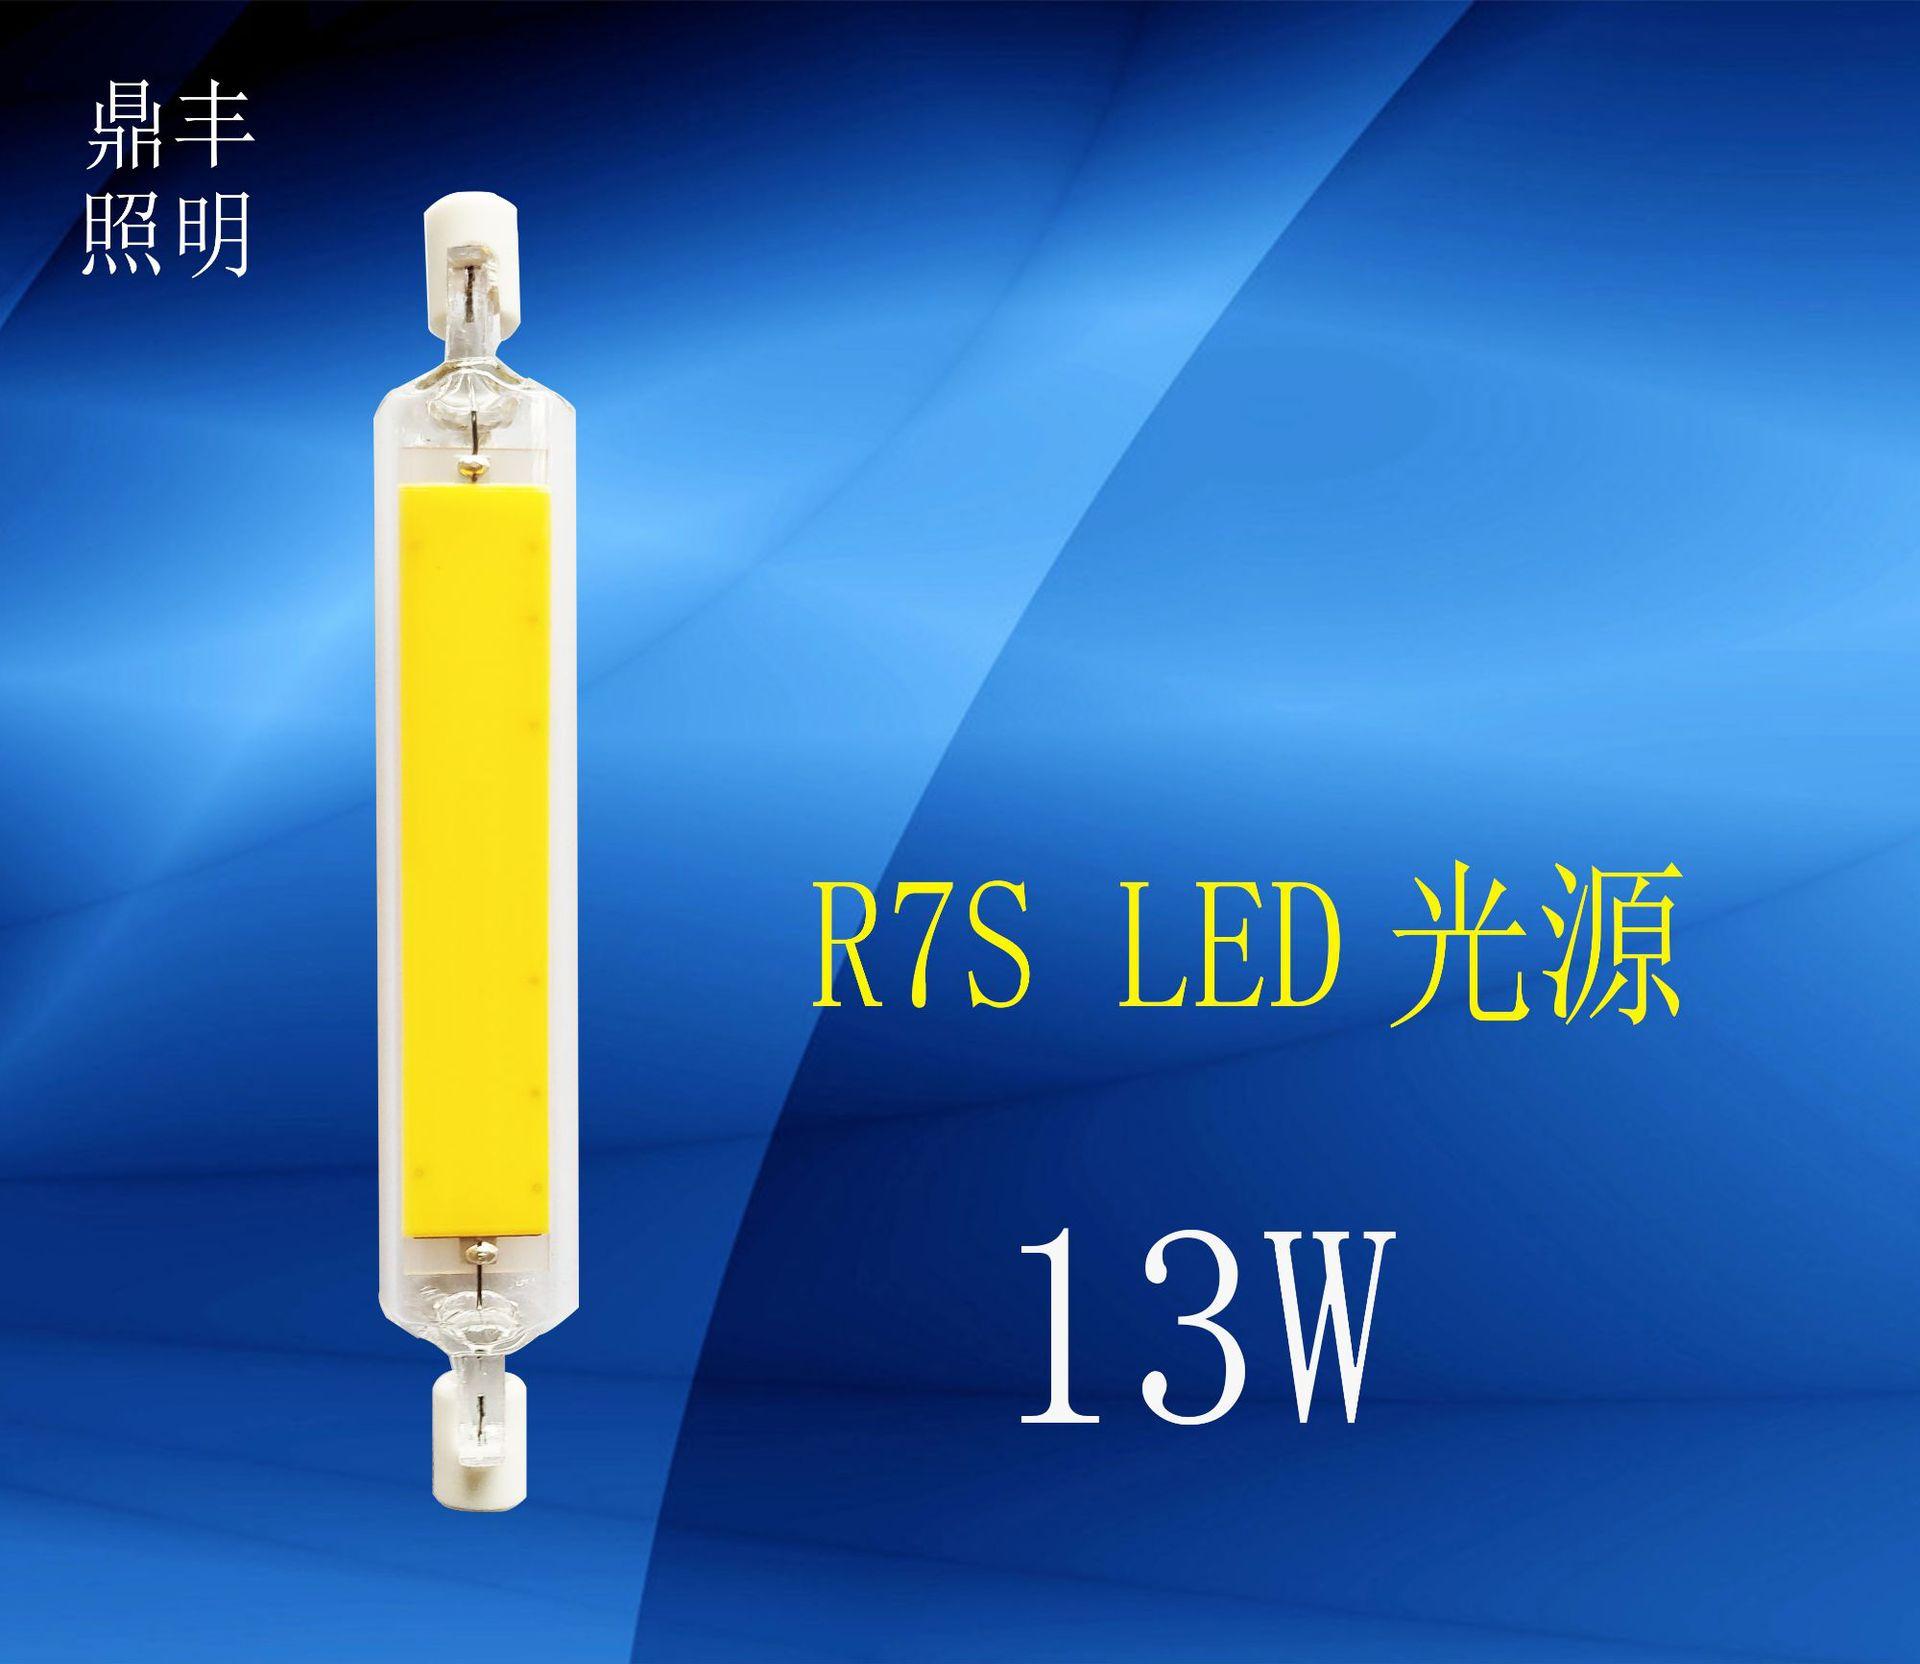 R7S玻璃led横插灯 118mm双端灯 13w 管径16mm360度发光 cob灯